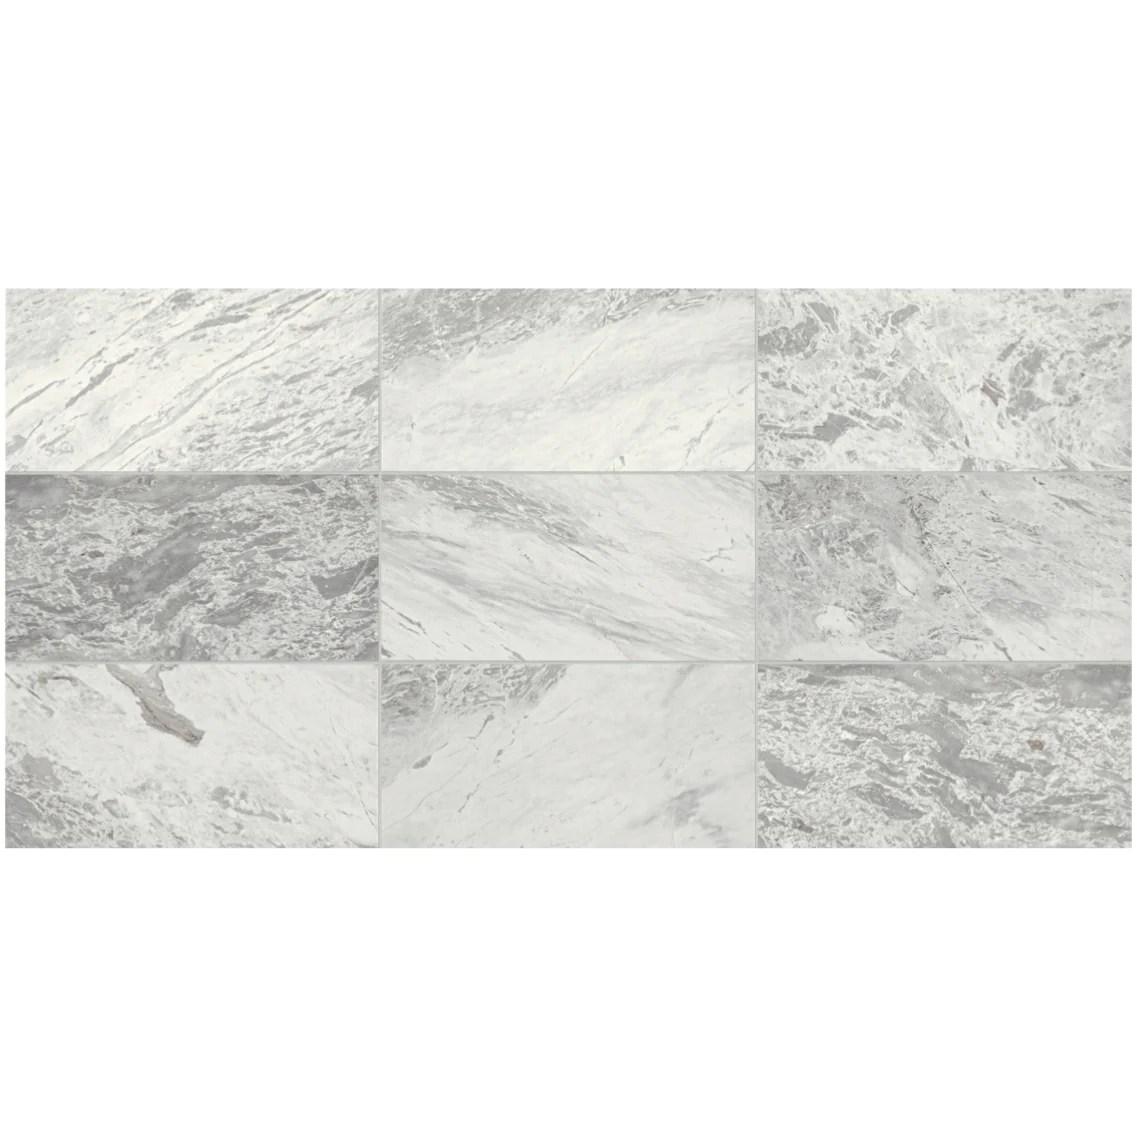 daltile raine 12 x 24 marble tile polished stratus white m017